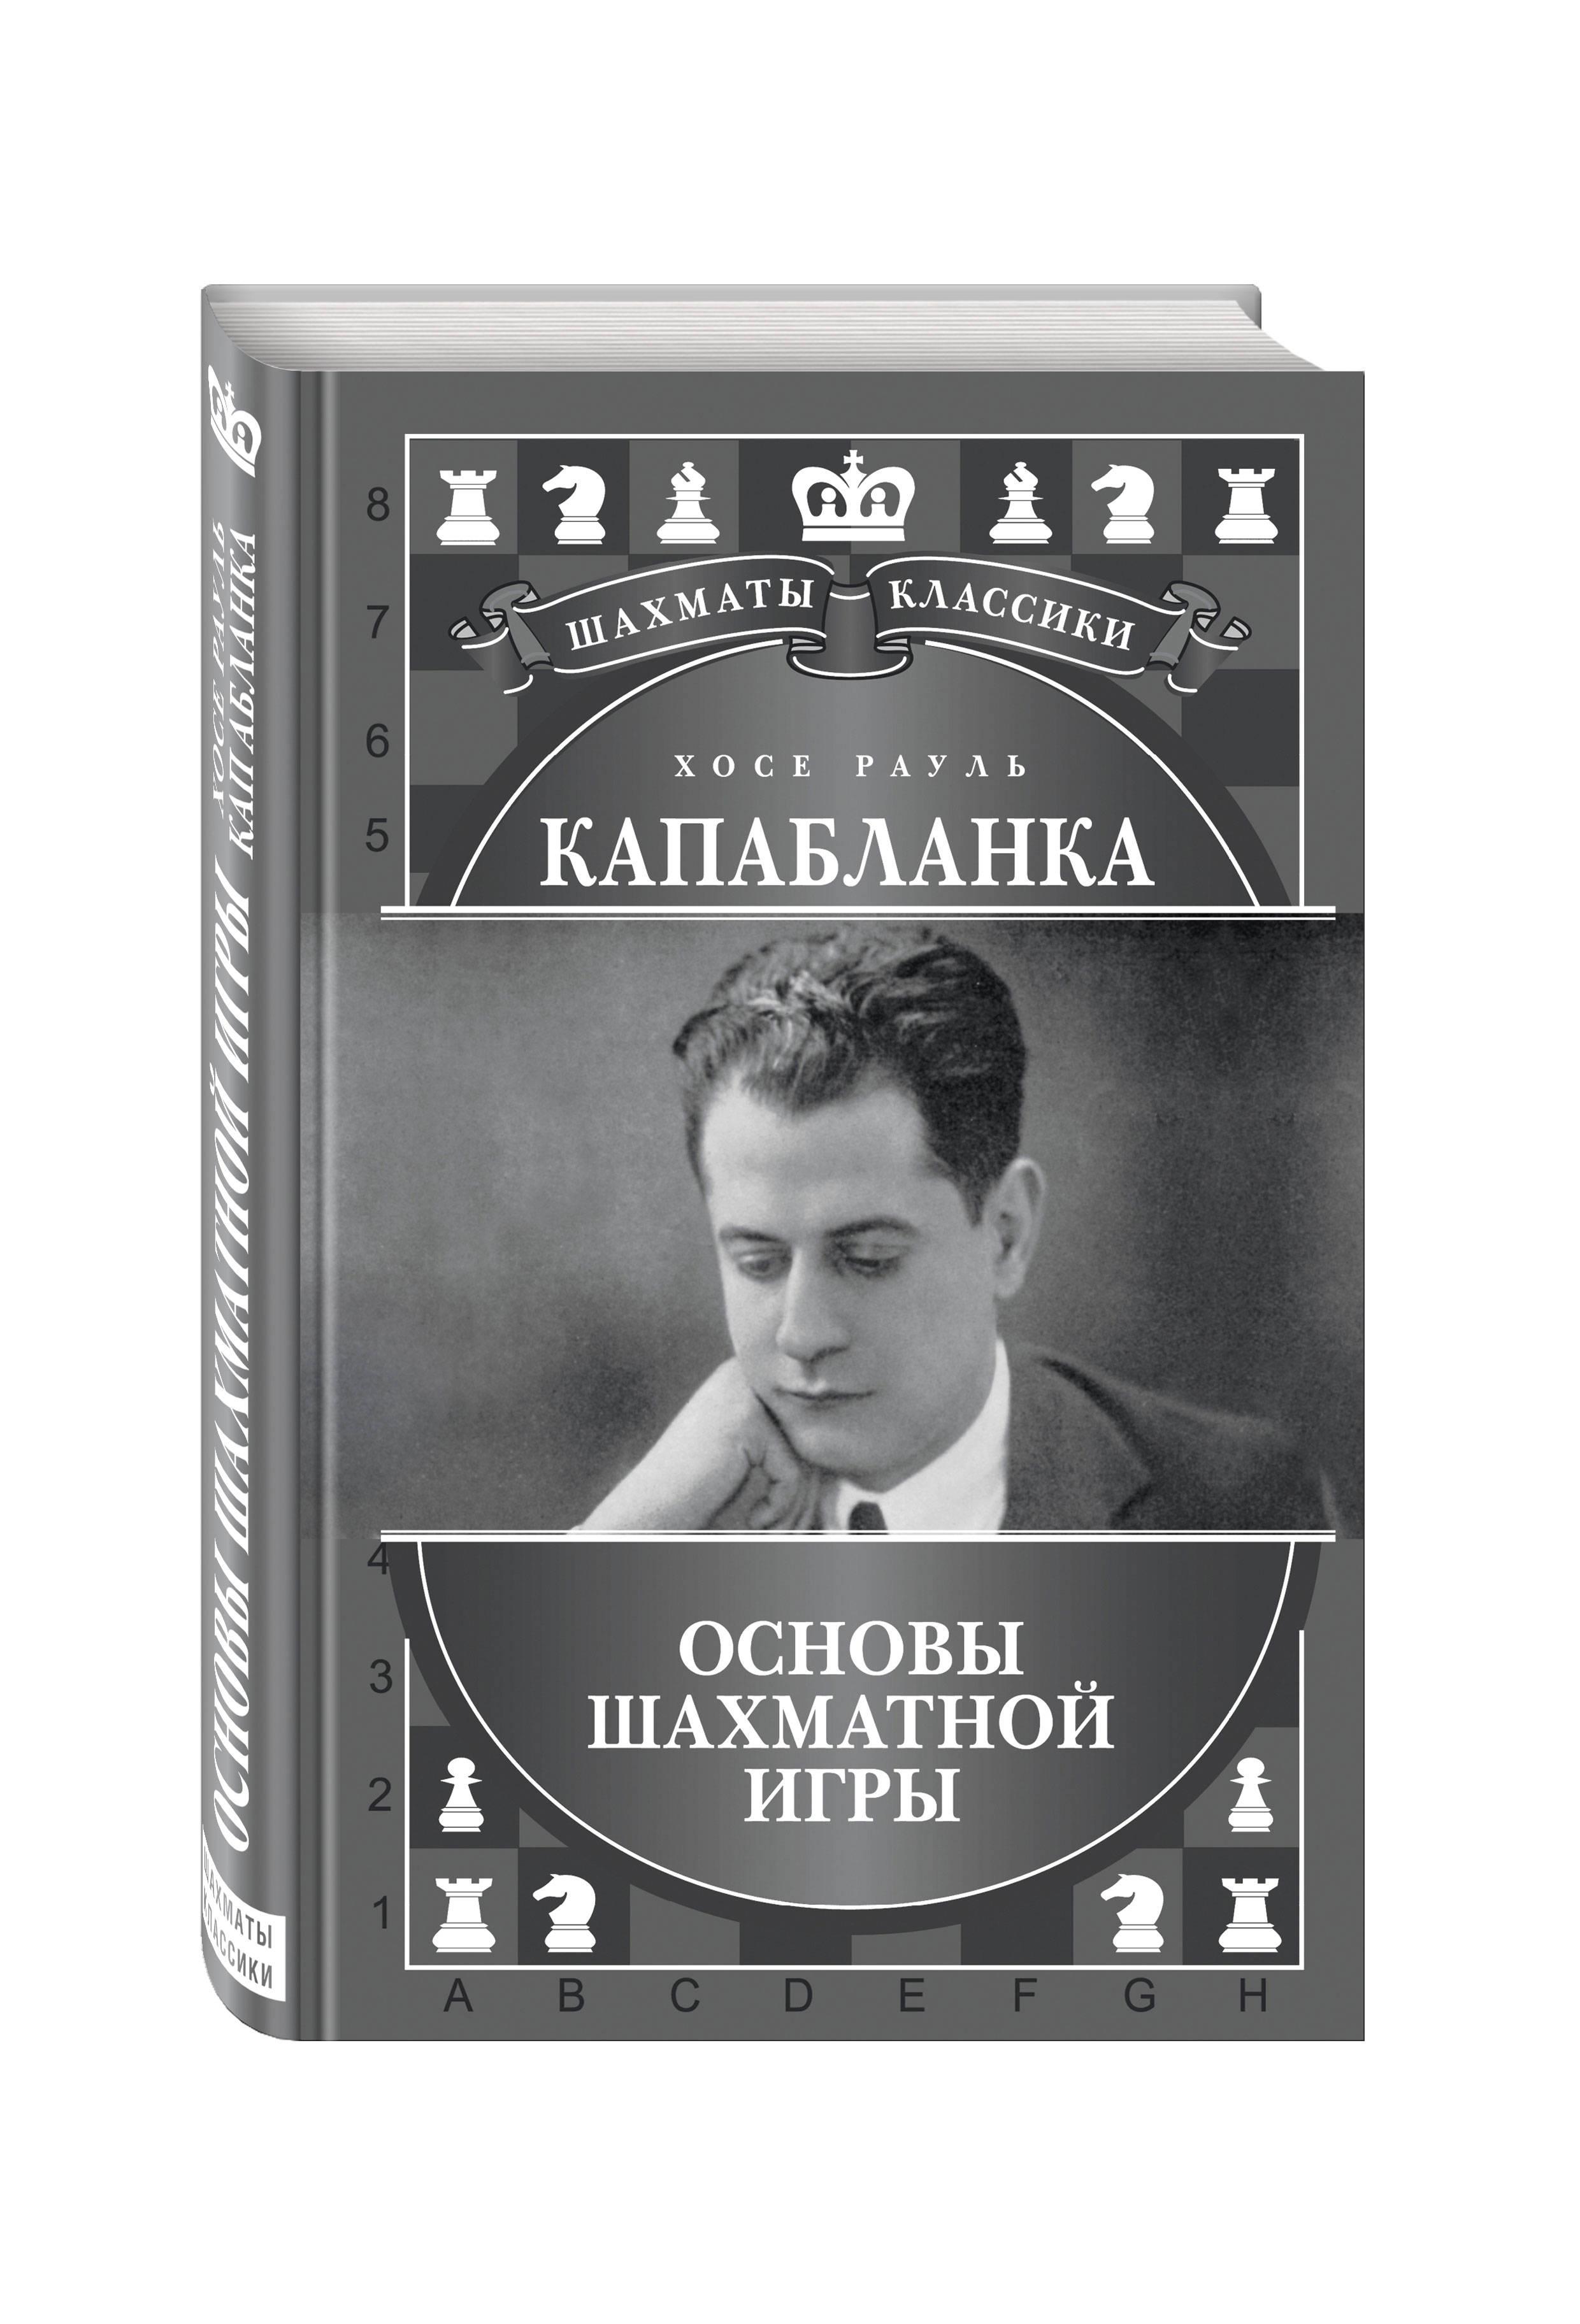 Хосе Рауль Капабланка. Основы шахматной игры от book24.ru